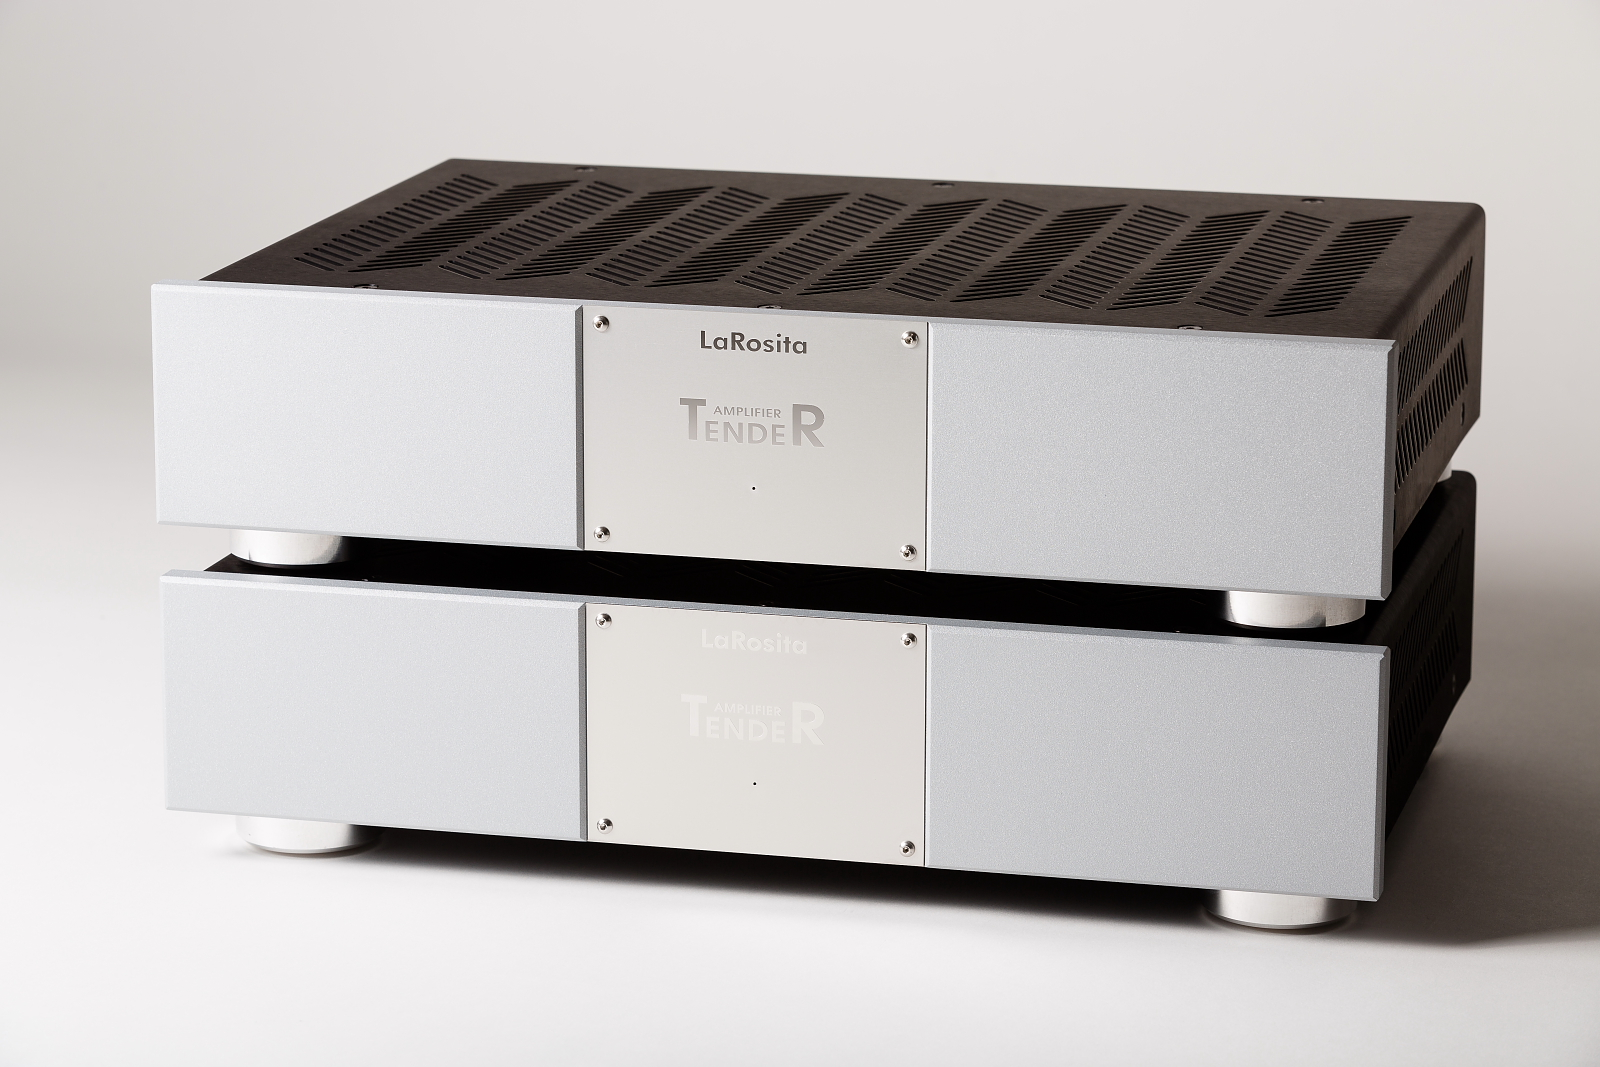 La Rosita Super Tender - 02 1600px